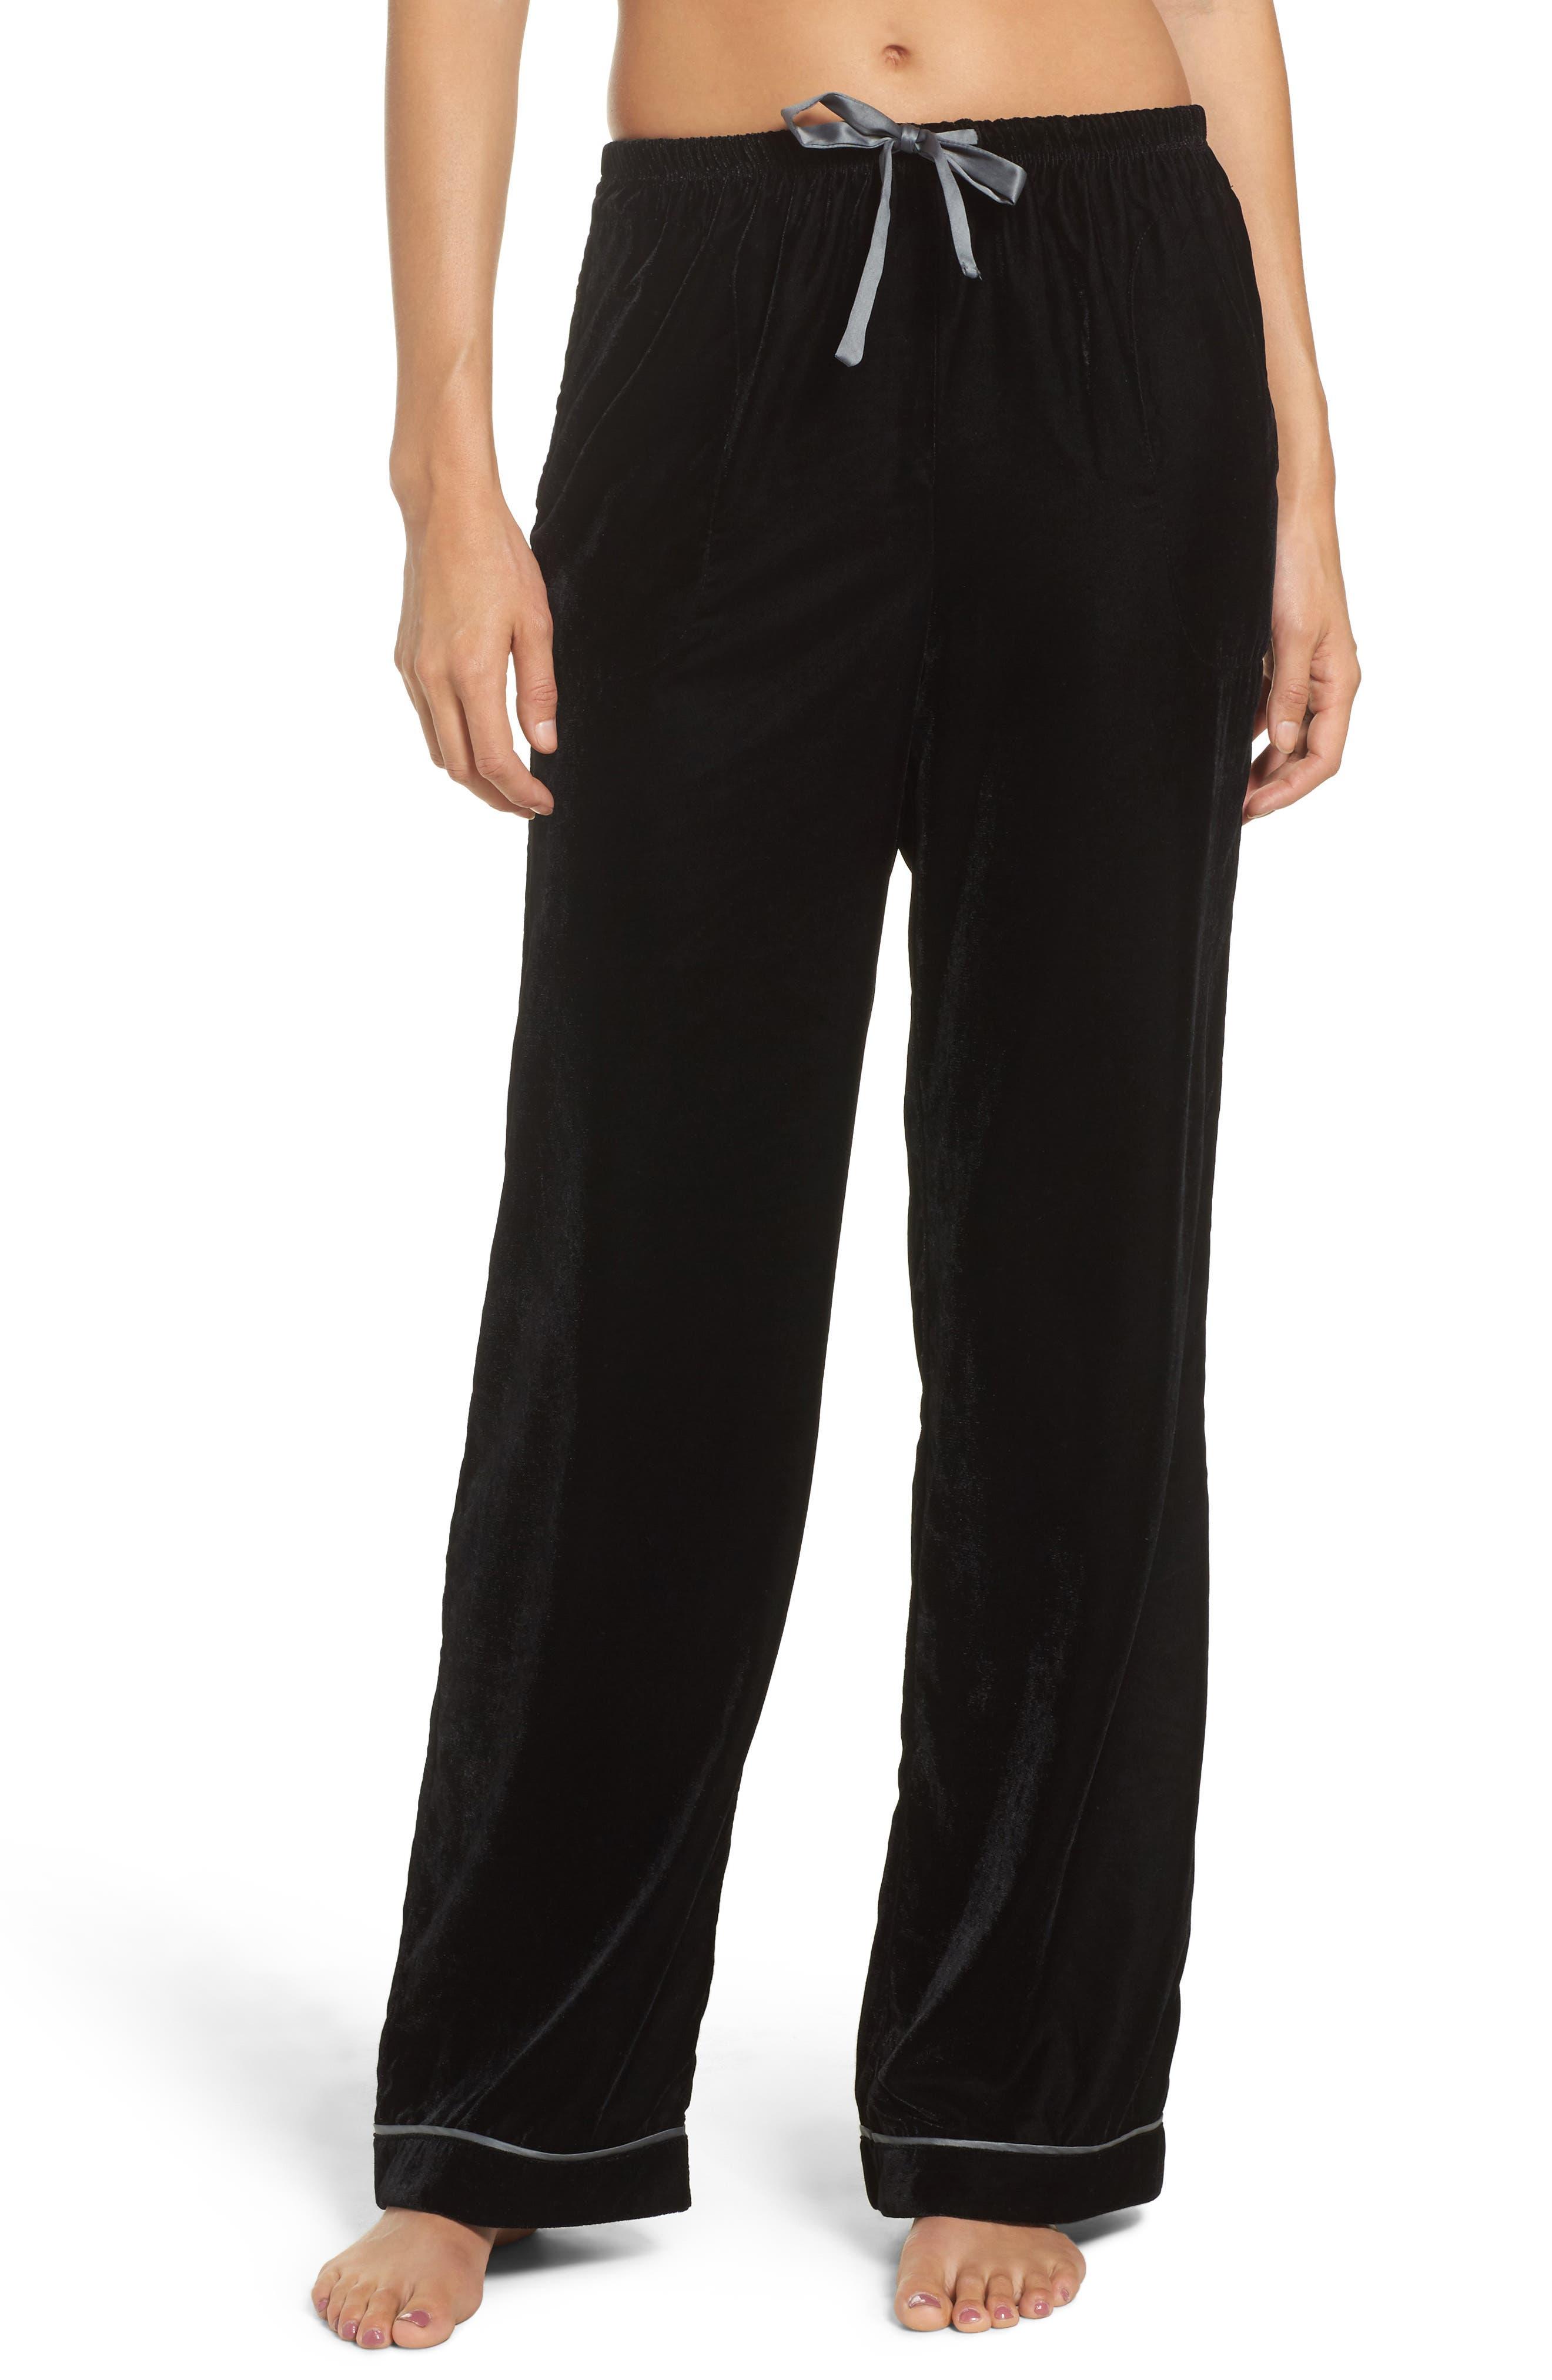 Velvet Pajama Pants,                             Main thumbnail 1, color,                             001